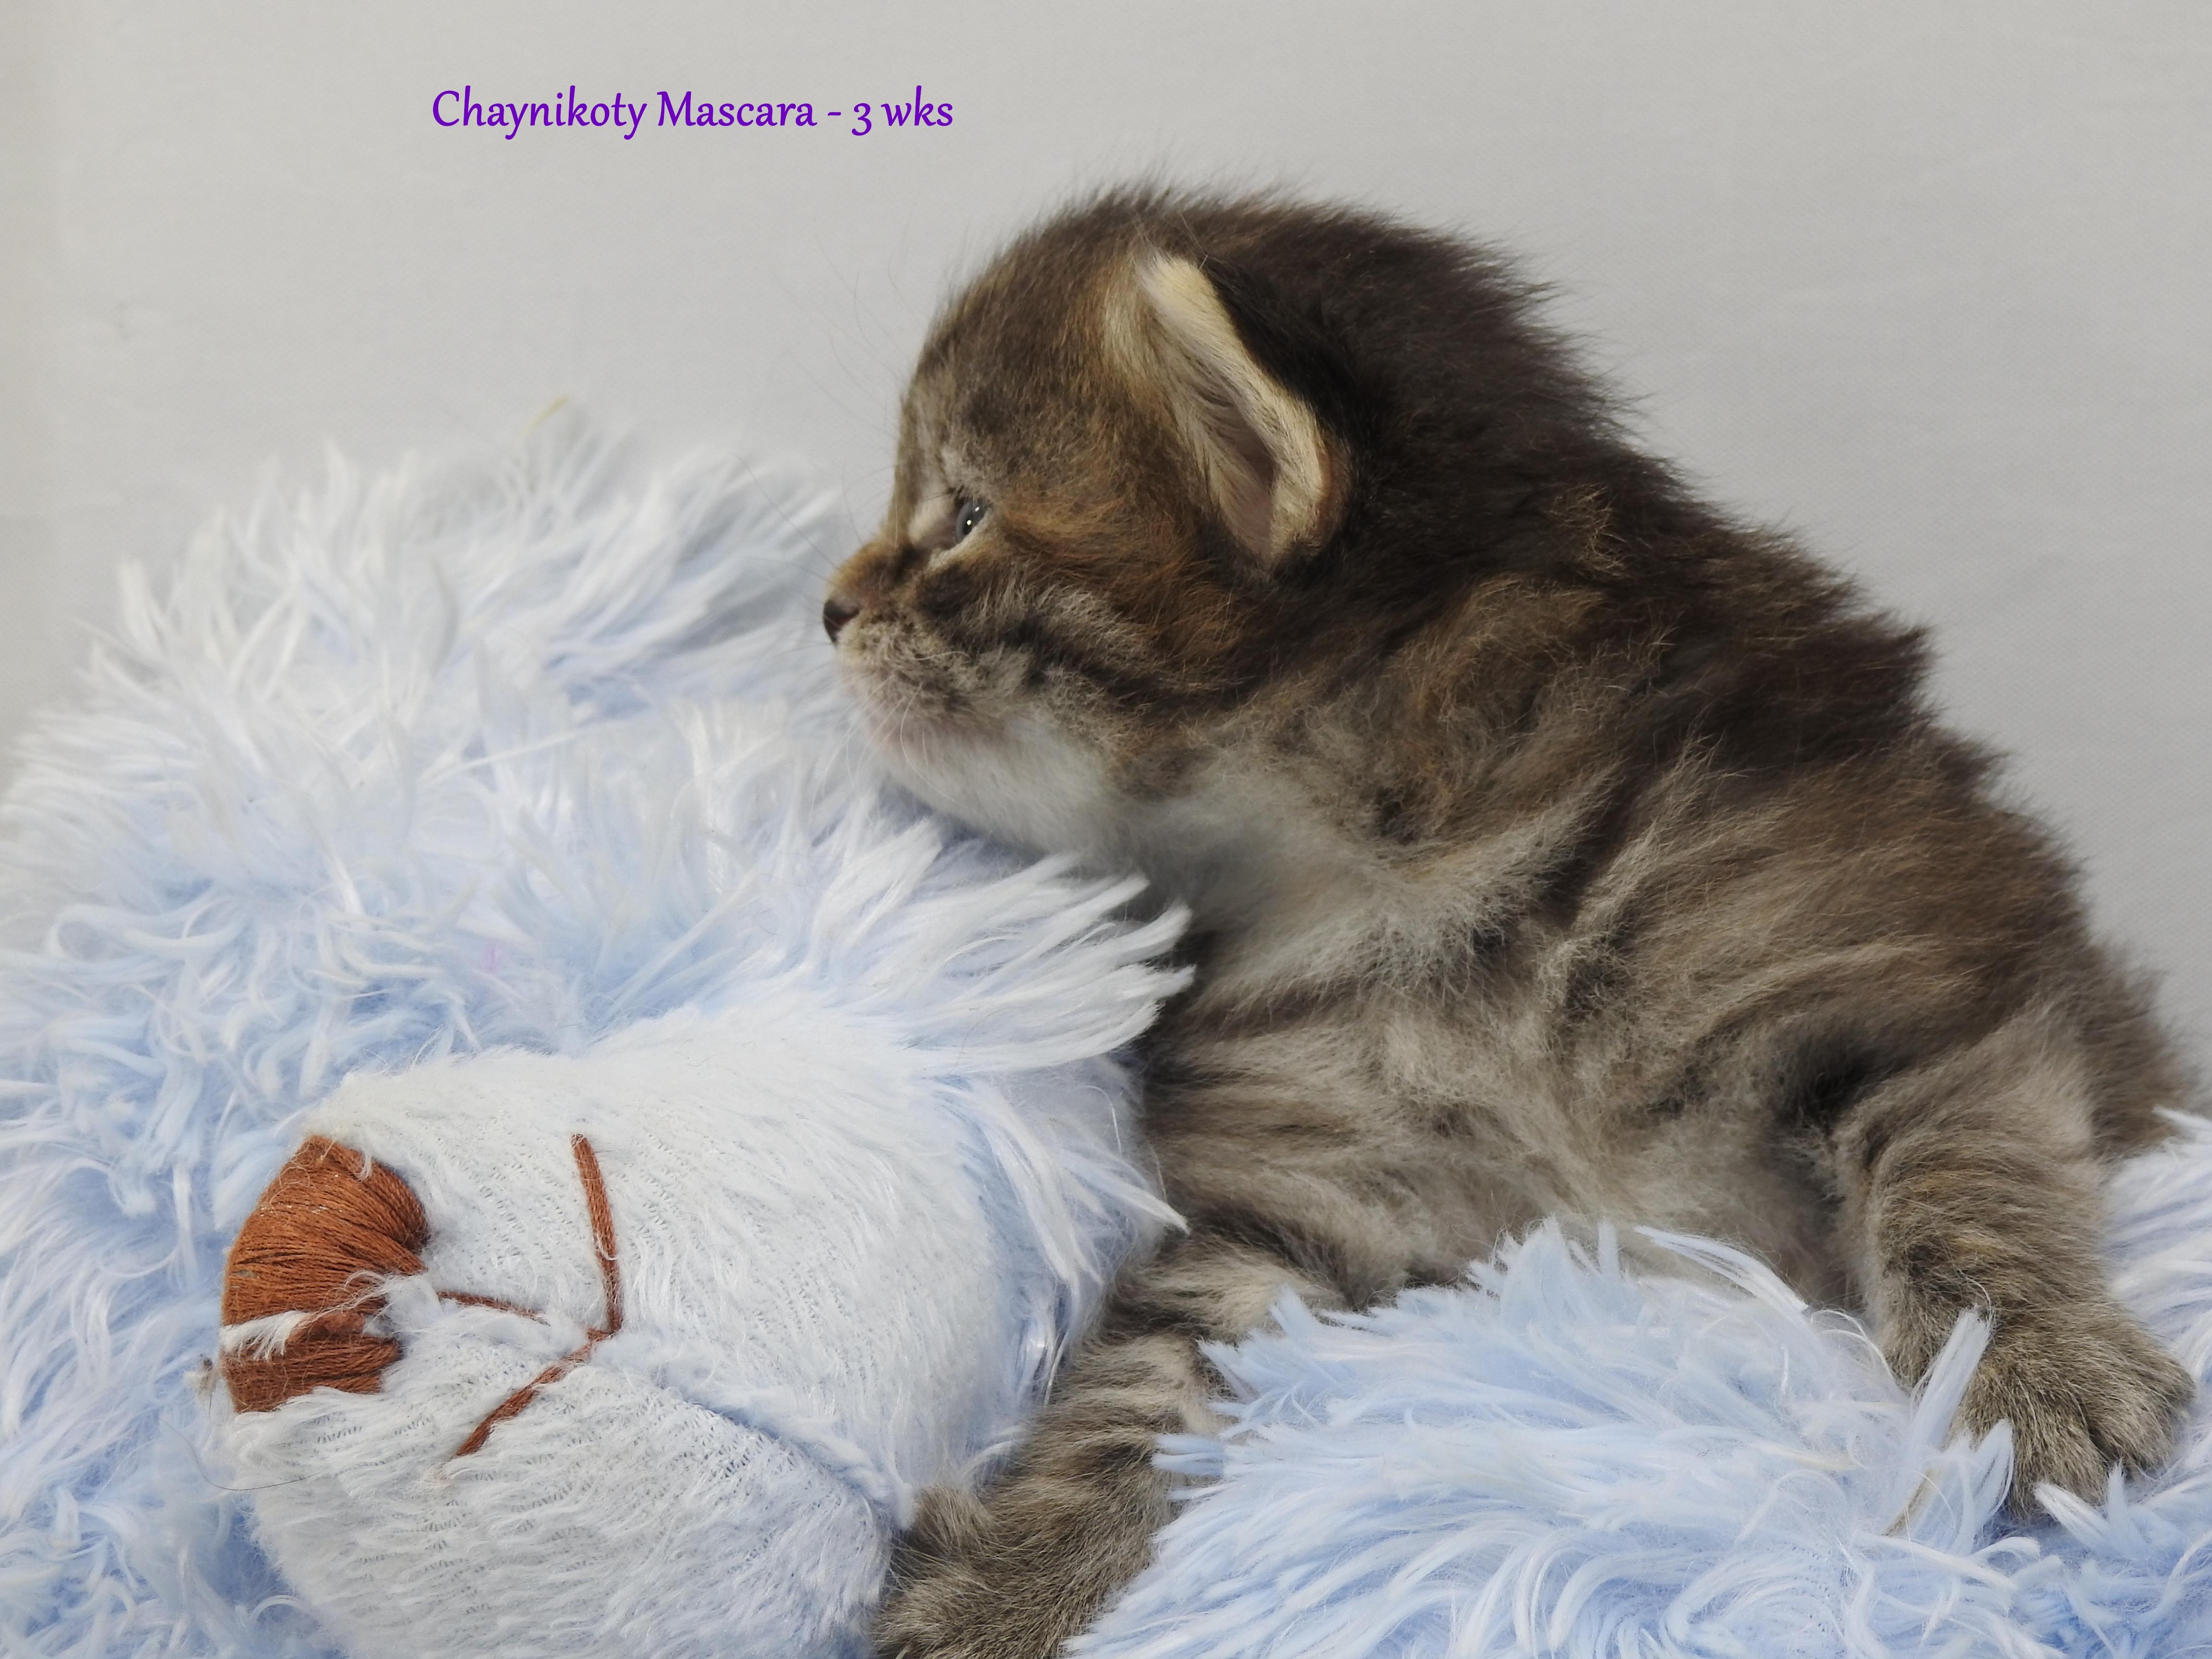 Chaynikoty Mascara - 3 wks